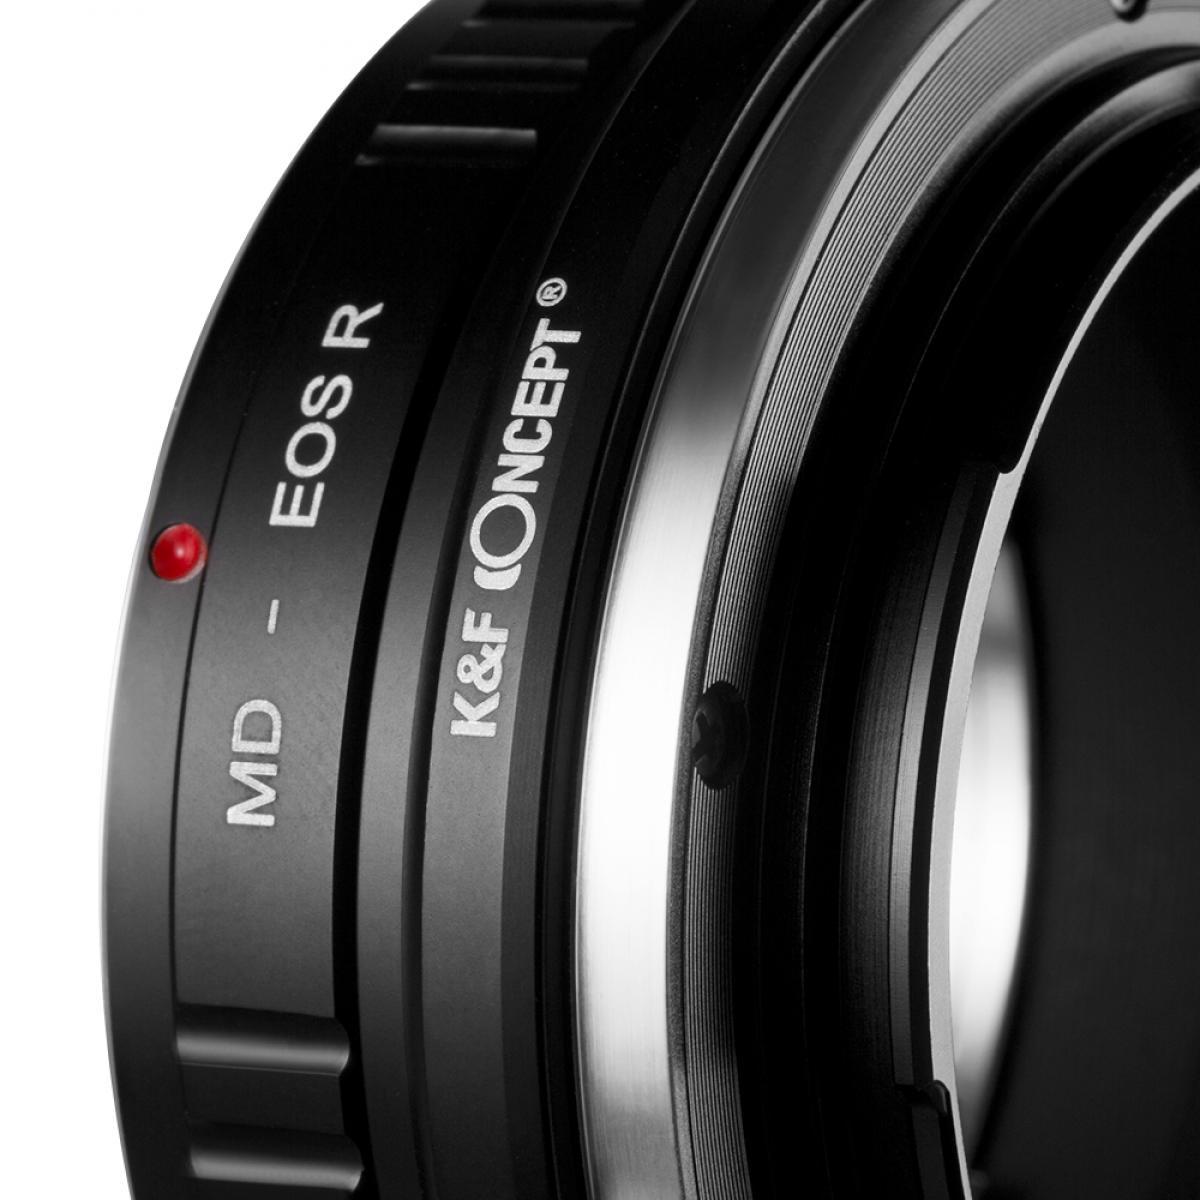 K&F M15194 Minolta MD Lenses to Canon RF Lens Mount Adapter